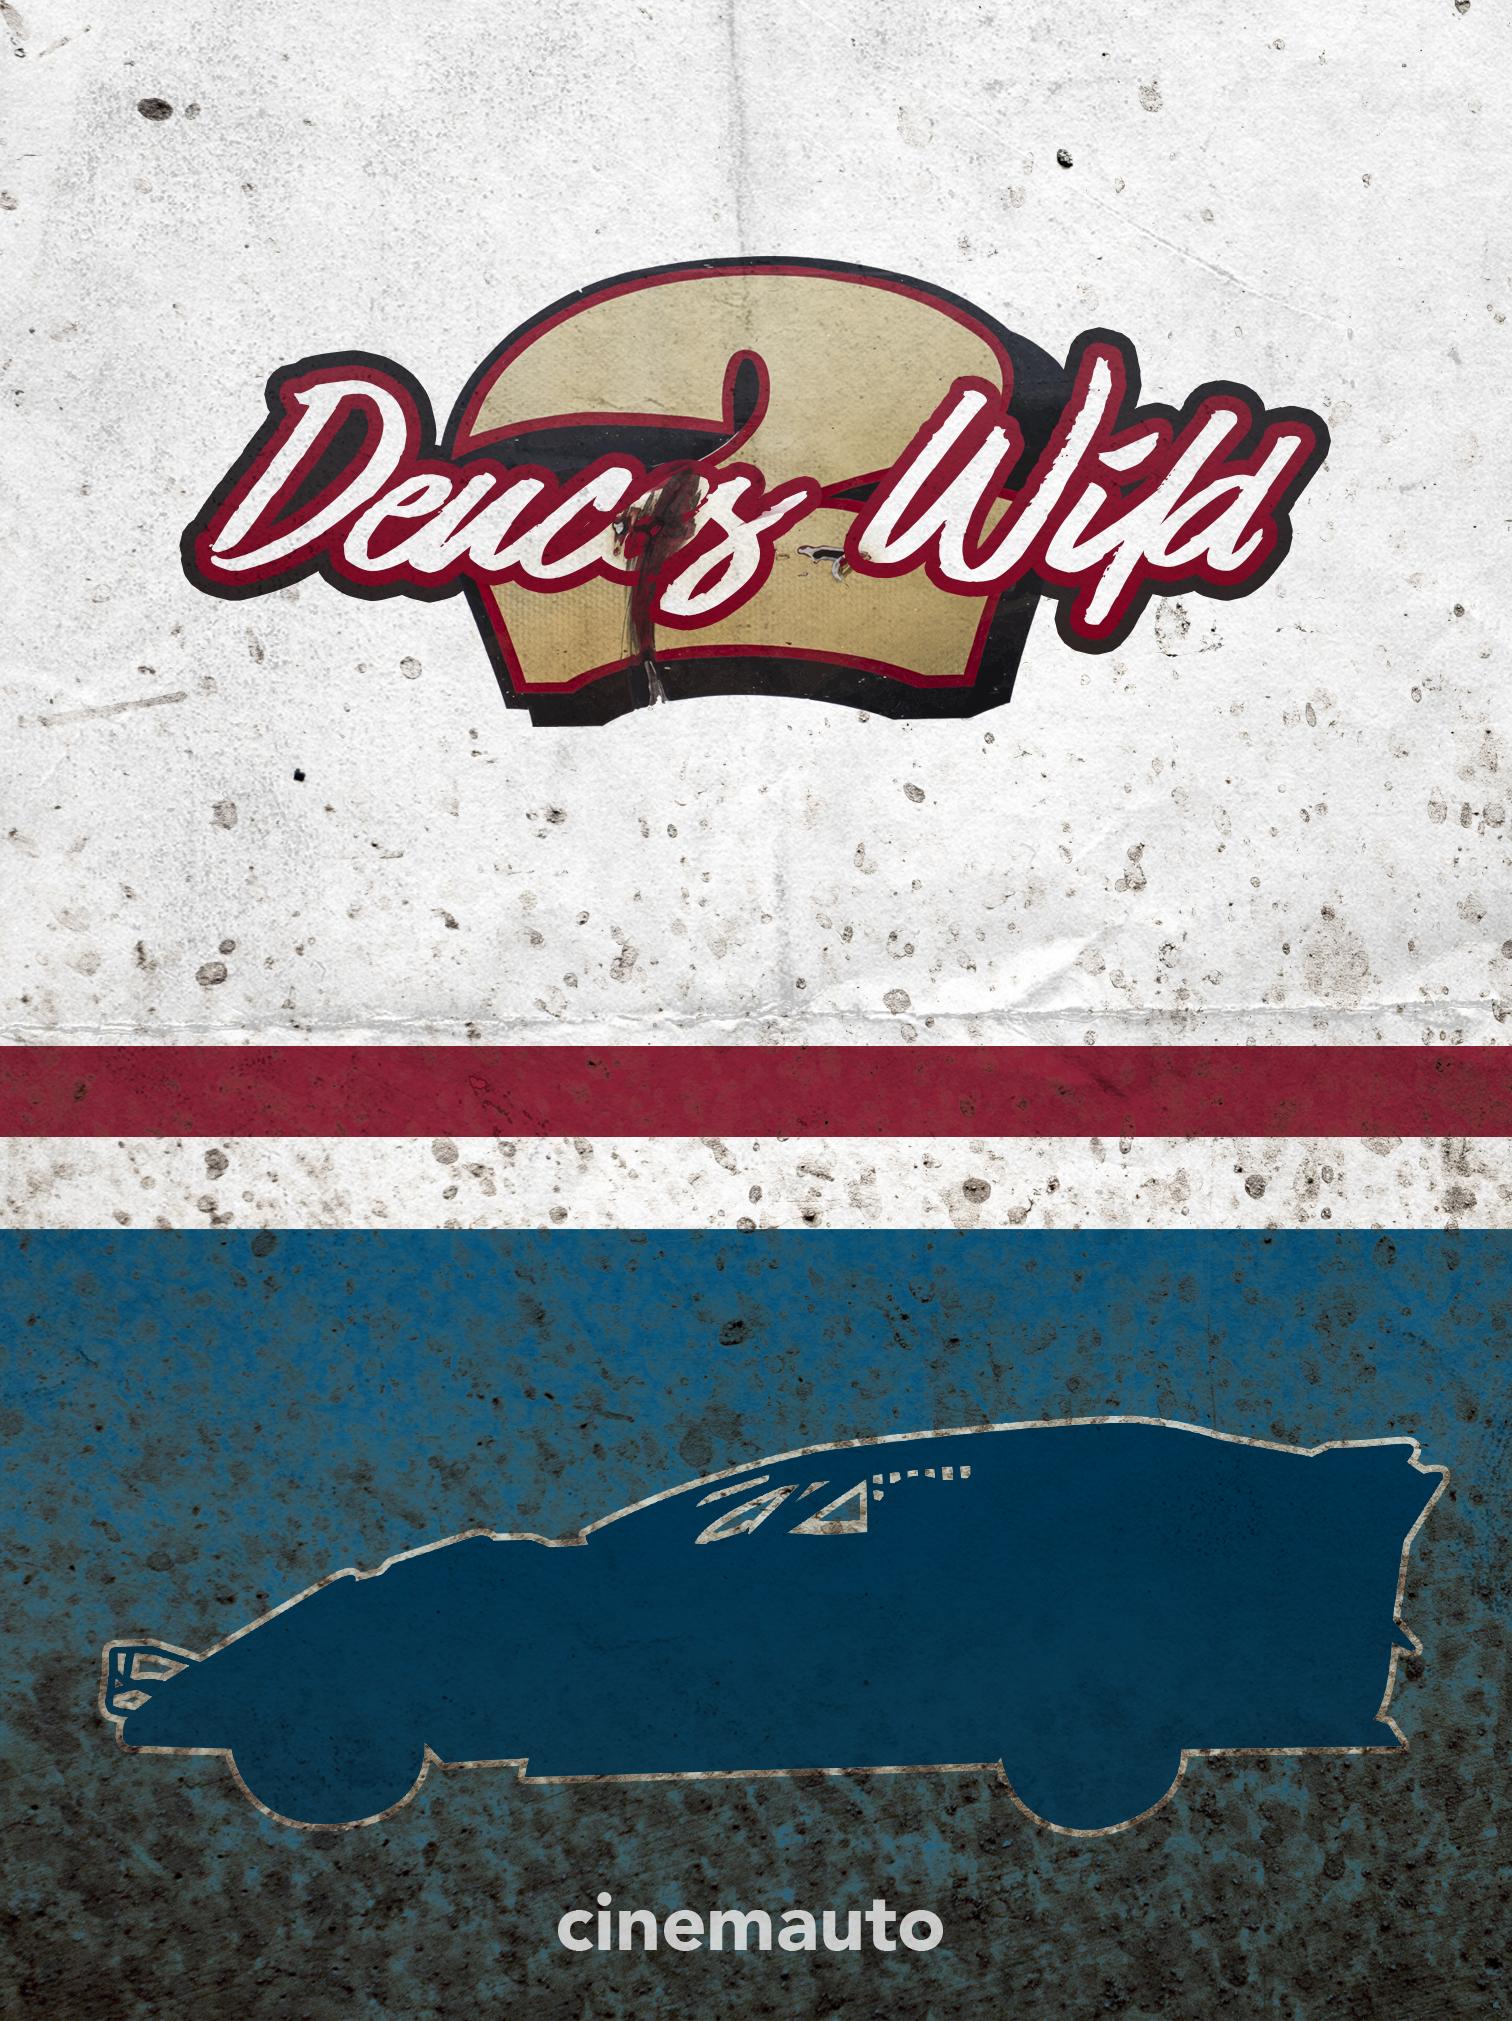 Posters-DeucesWild.jpg